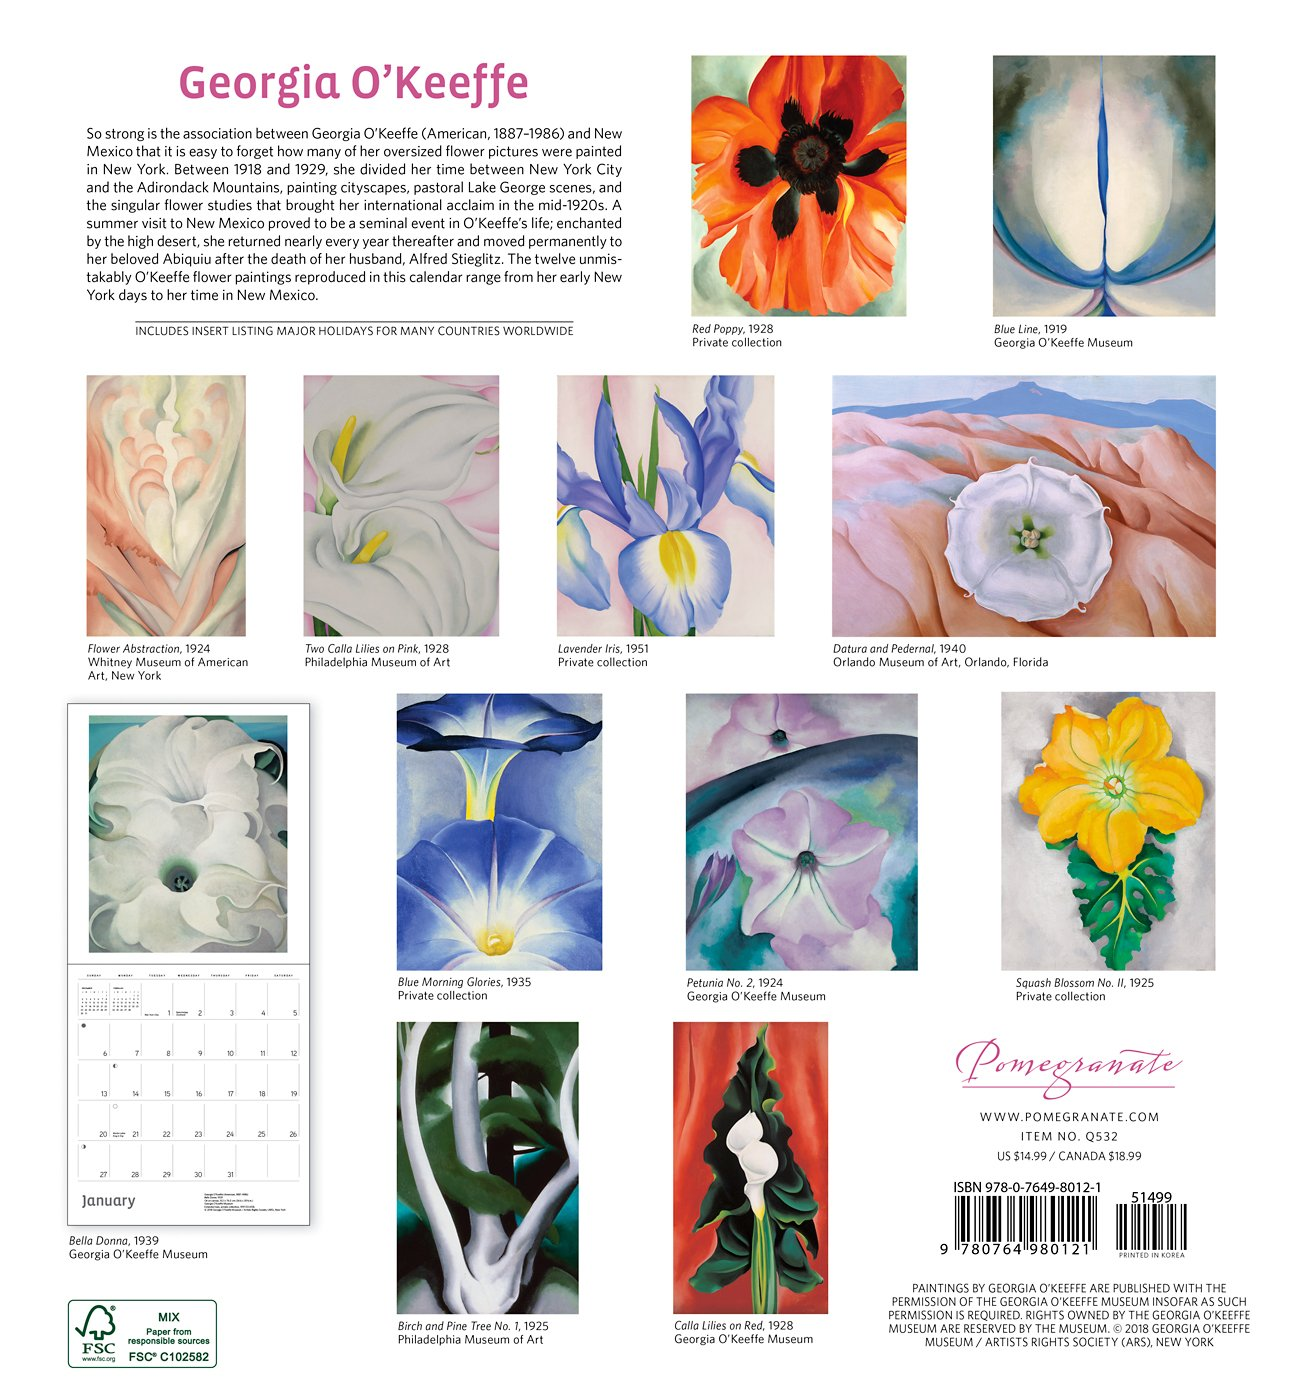 Georgia O'Keeffe 2019 Wall Calendar: Georgia O'Keeffe: 9780764980121:  Amazon.com: Books